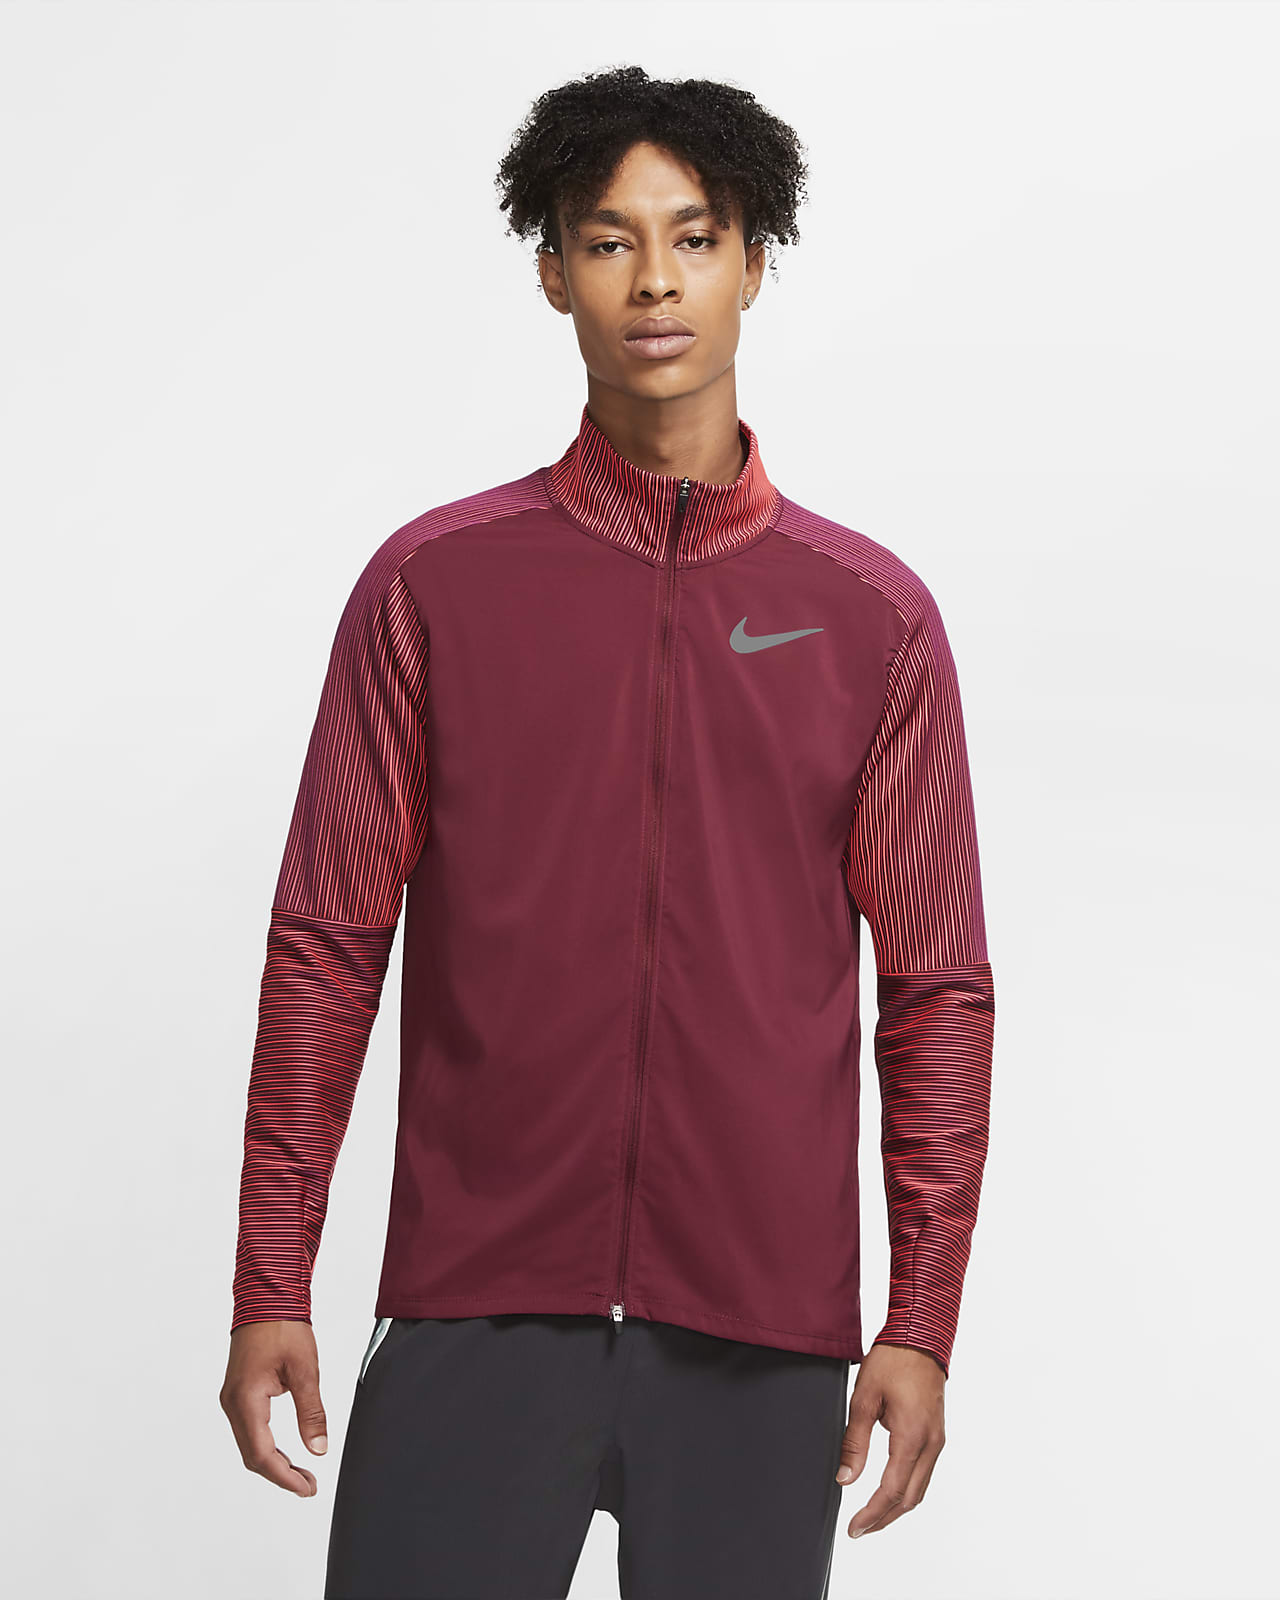 Nike Future Fast Men's Hybrid Running